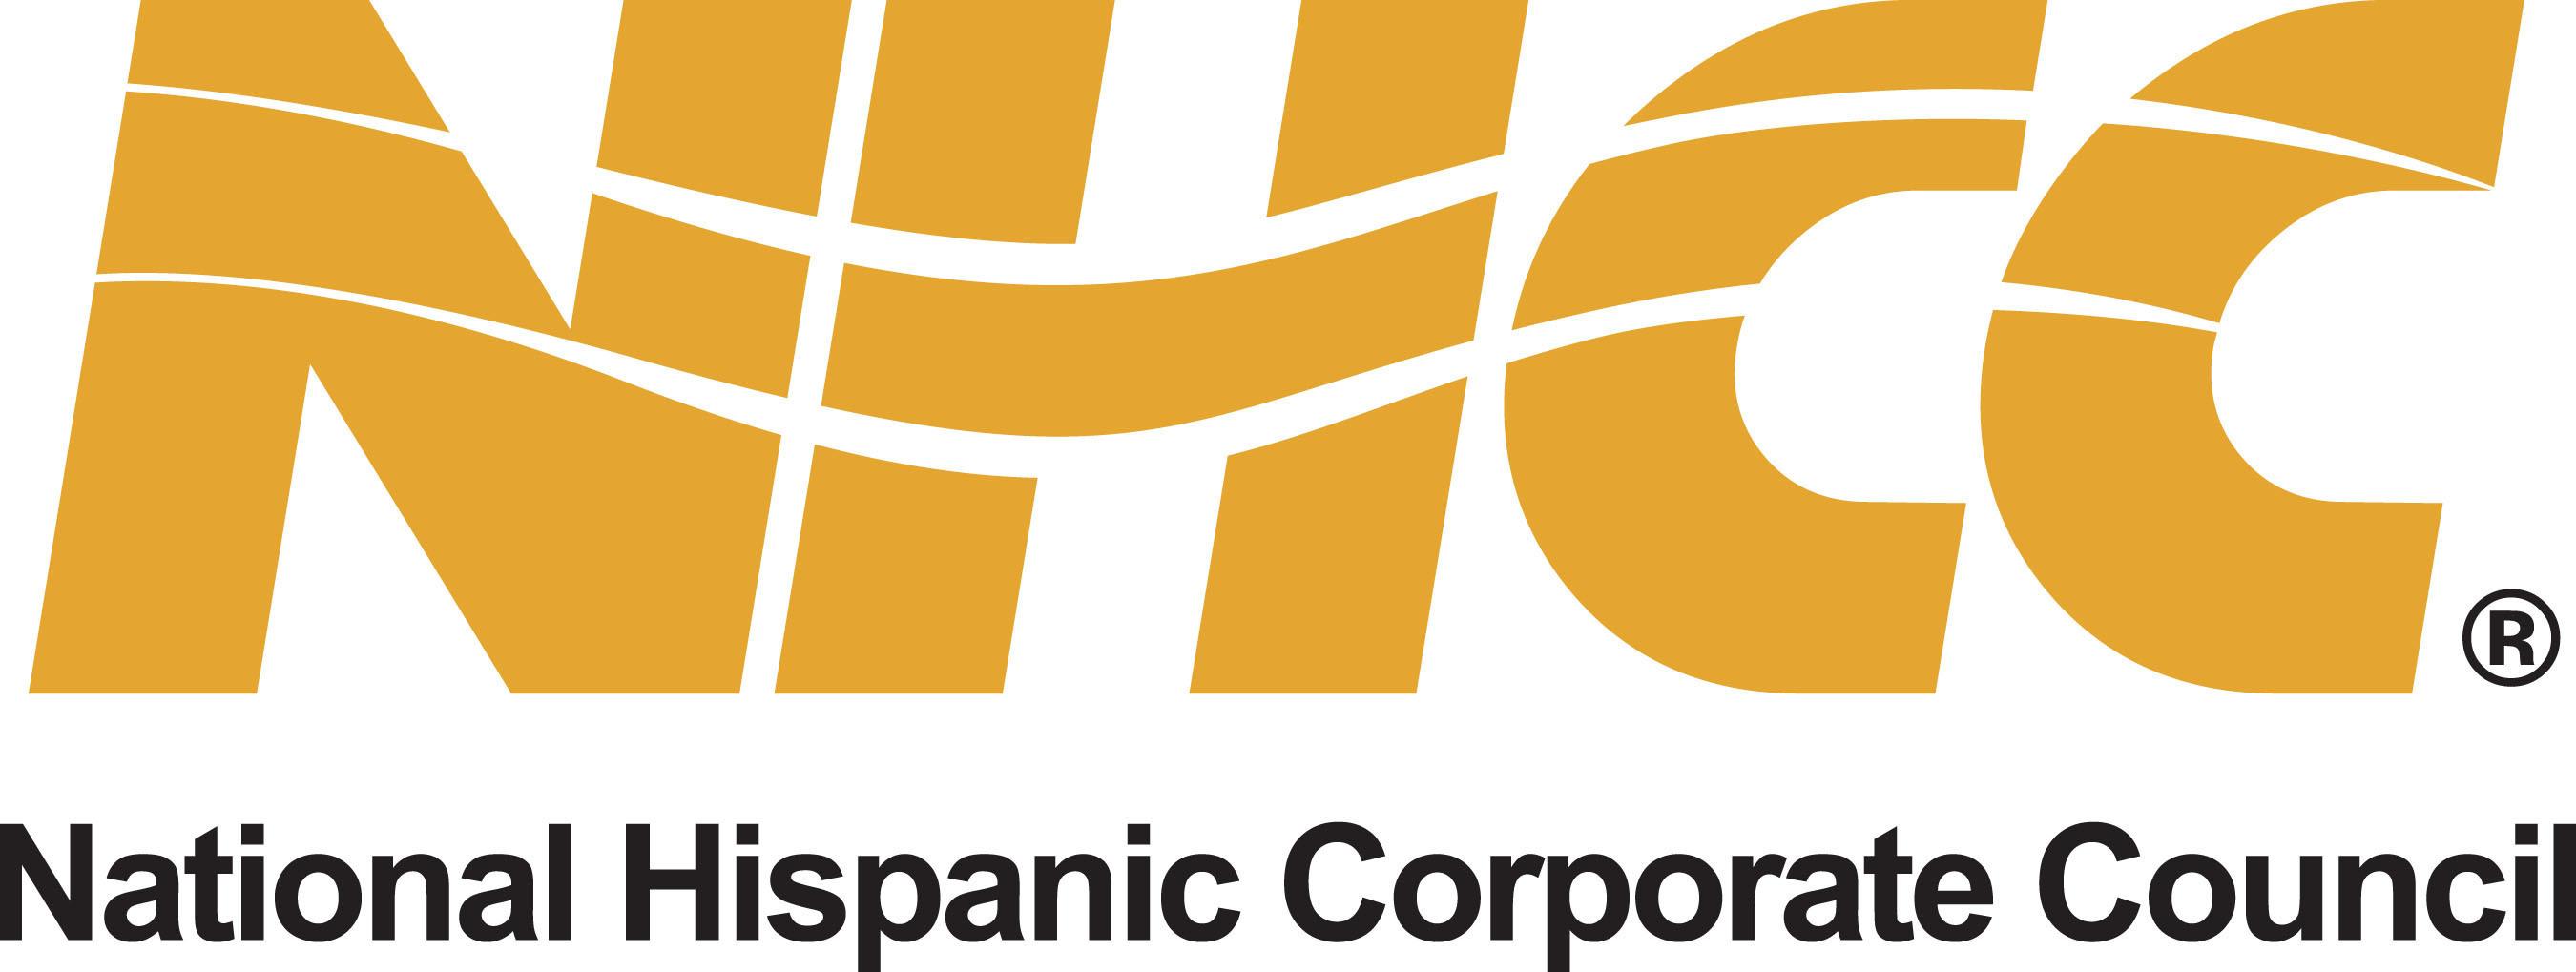 NATIONAL HISPANIC CORPORATE COUNCIL (NHCC) LOGO